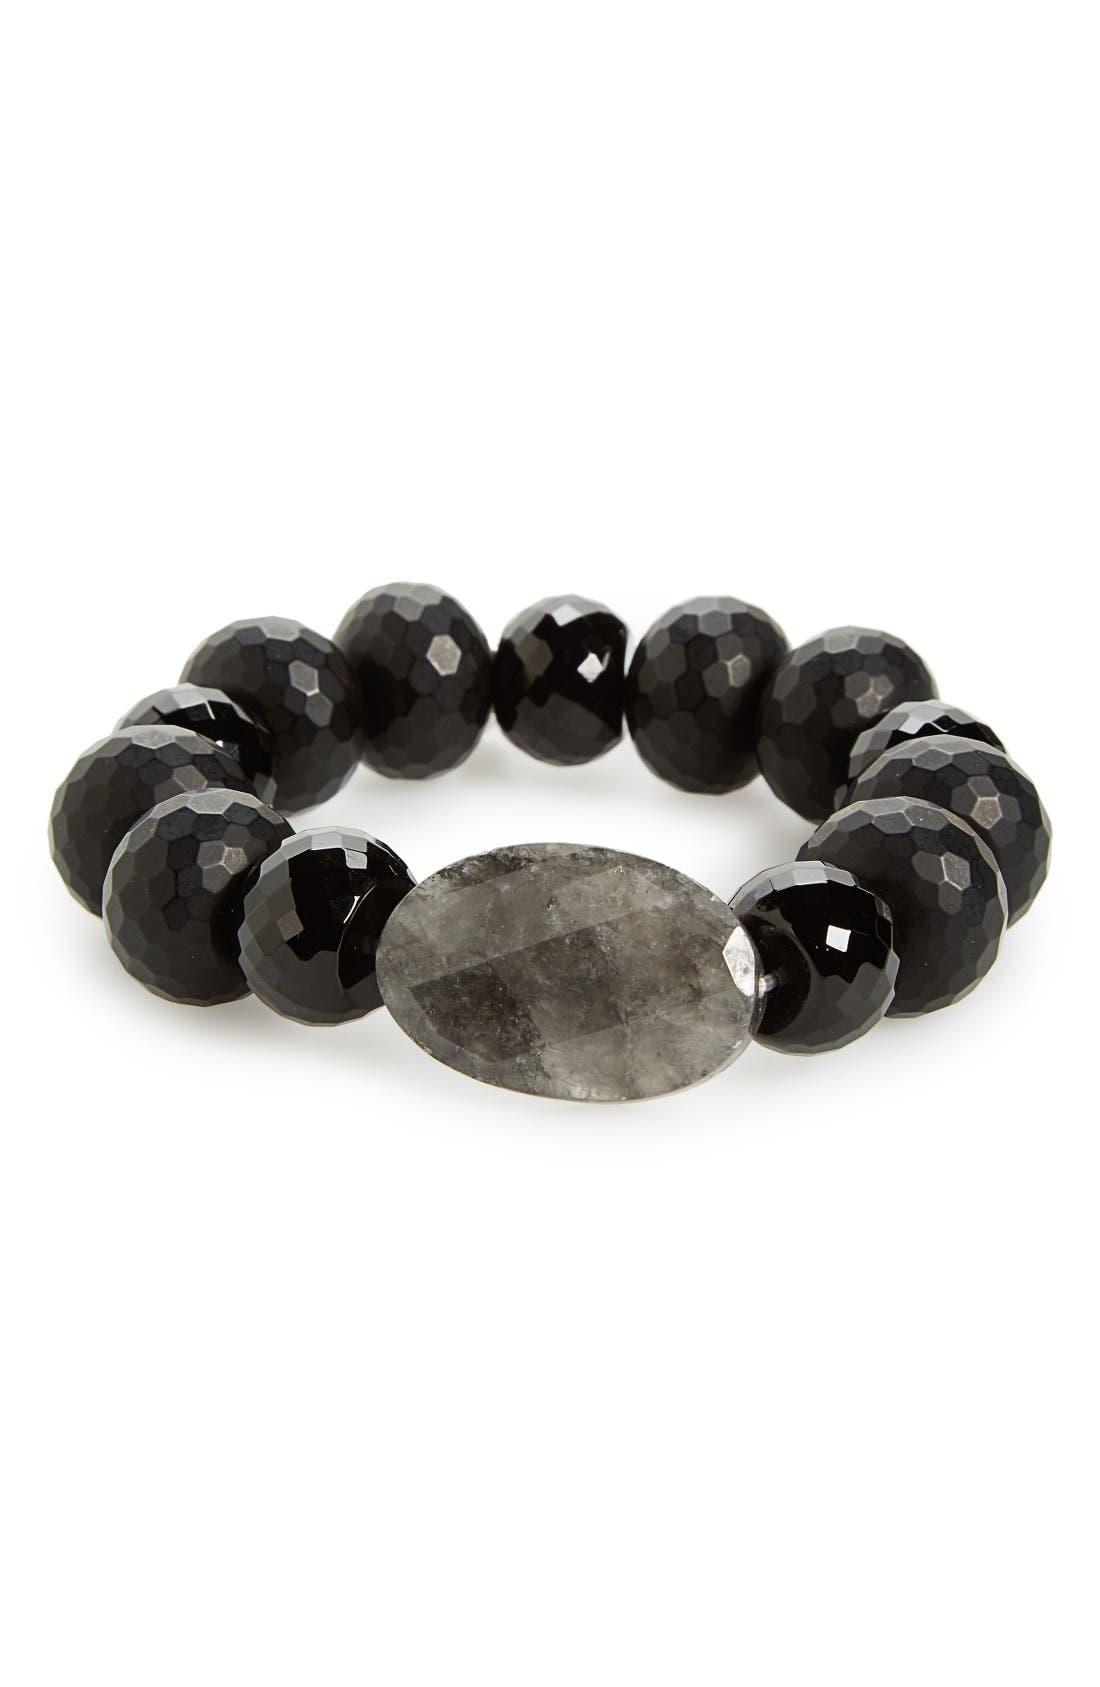 Alternate Image 1 Selected - Chan Luu Semiprecious Stone Stretch Bracelet